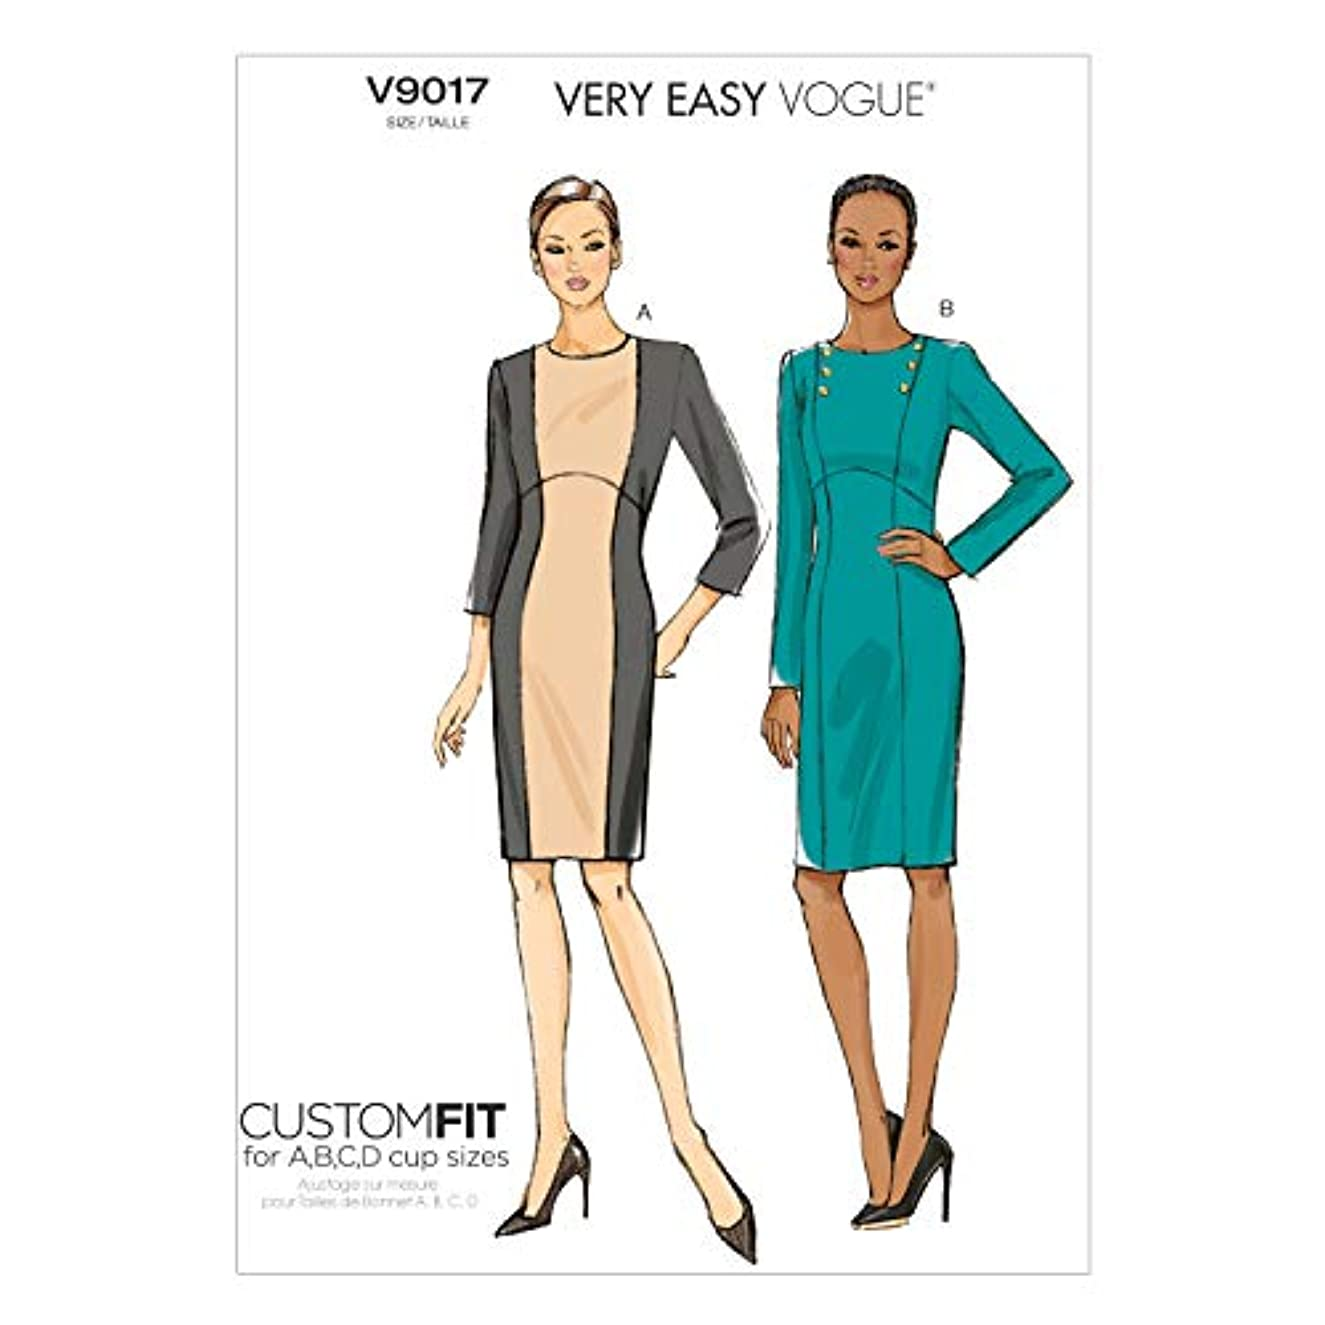 Vogue Patterns V9017 Misses' Dress Sewing Template, Size A5 (6-8-10-12-14)